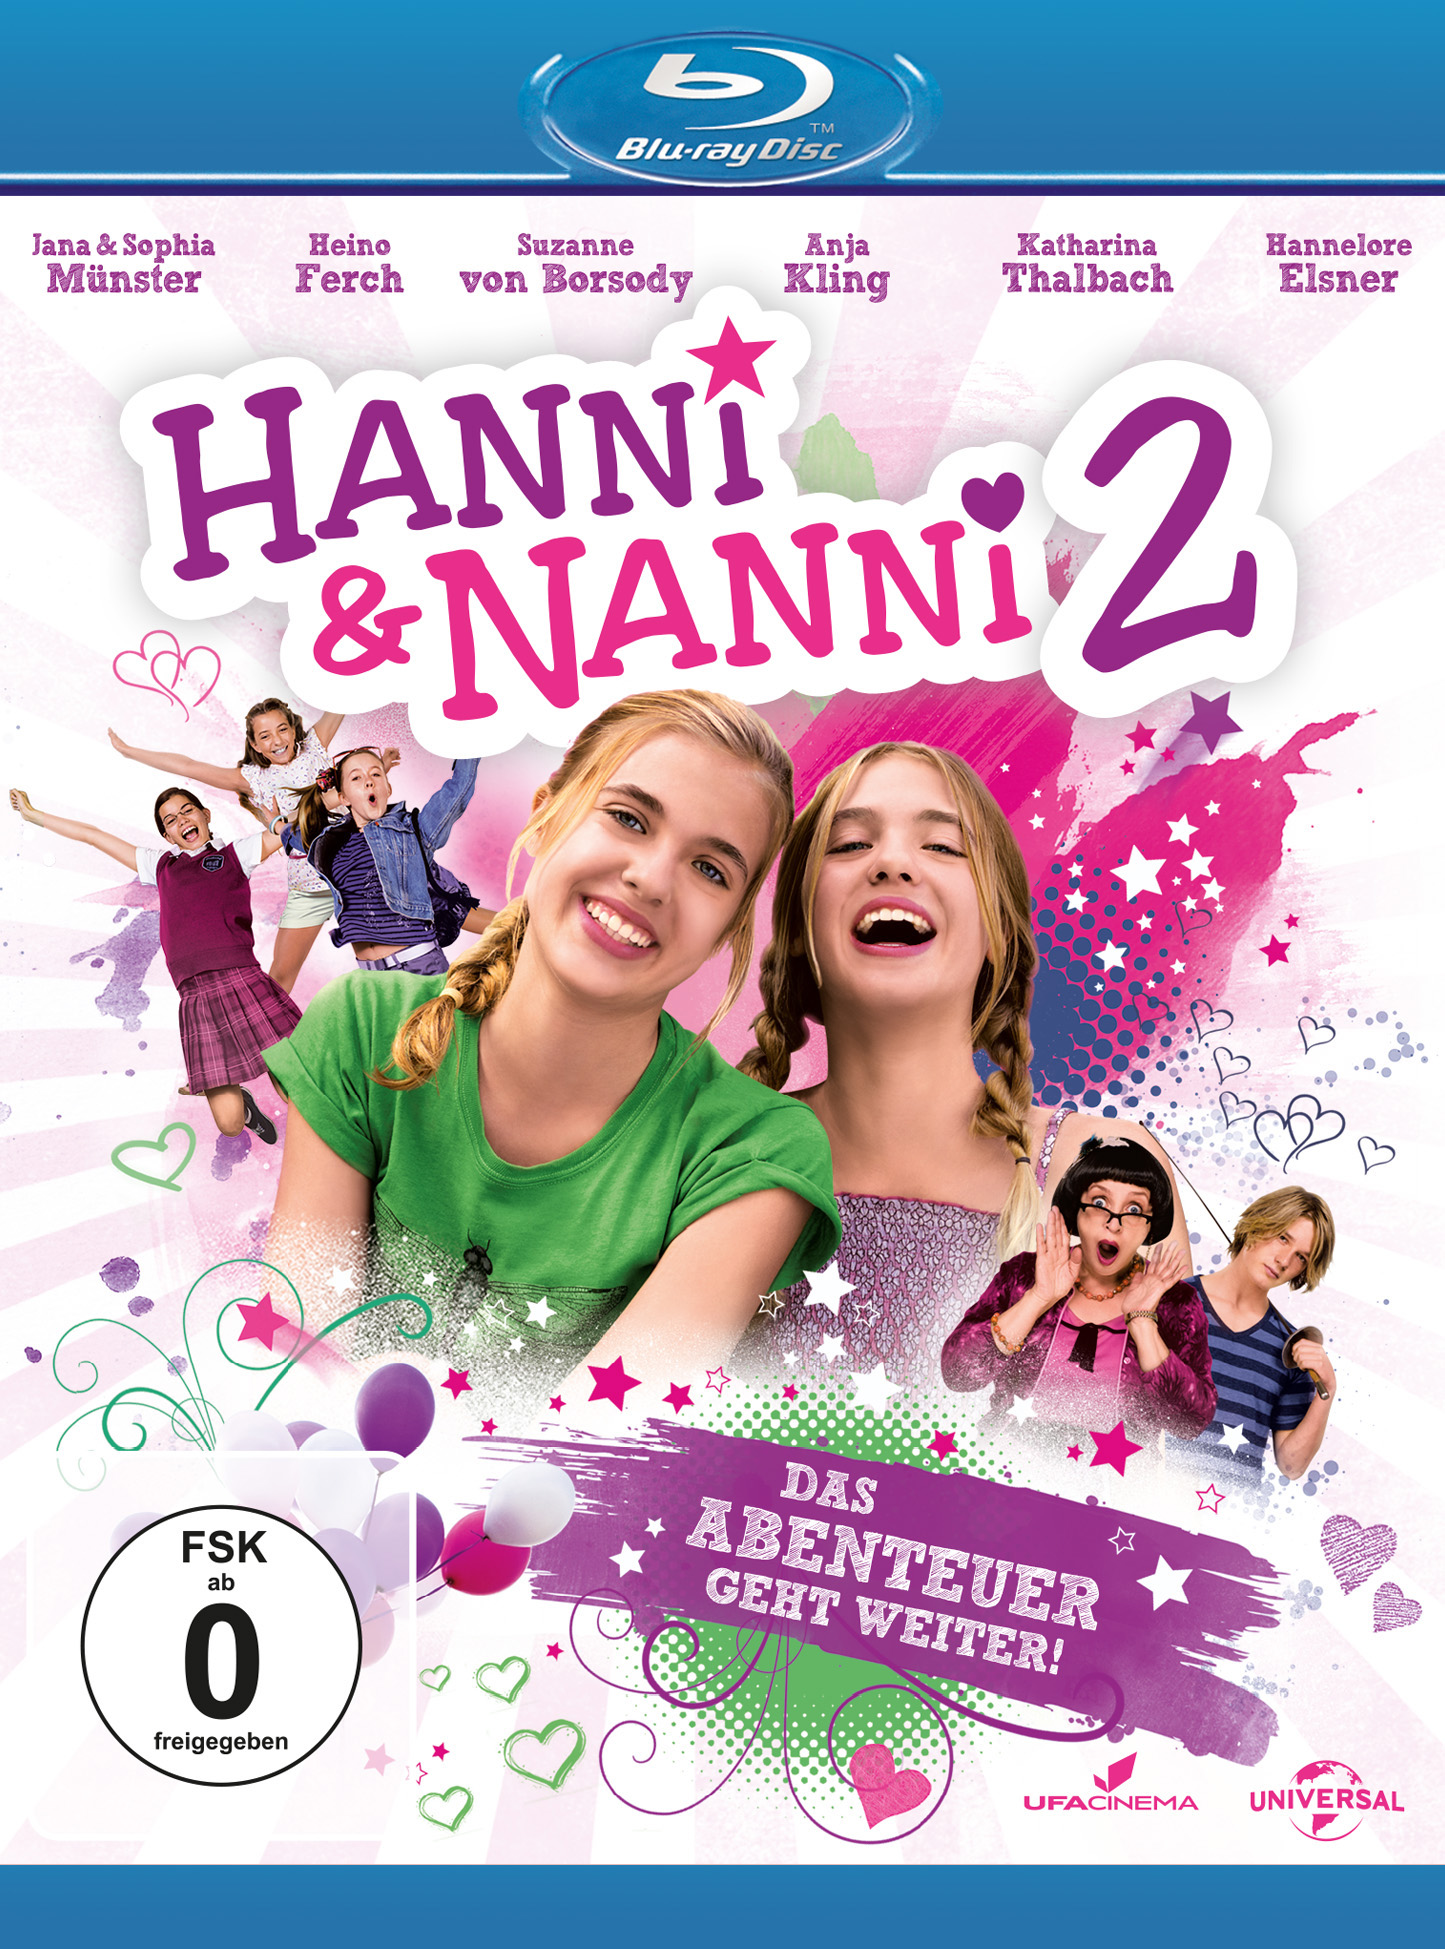 Verfügbarkeit | Hanni & Nanni 2 | filmportal.de